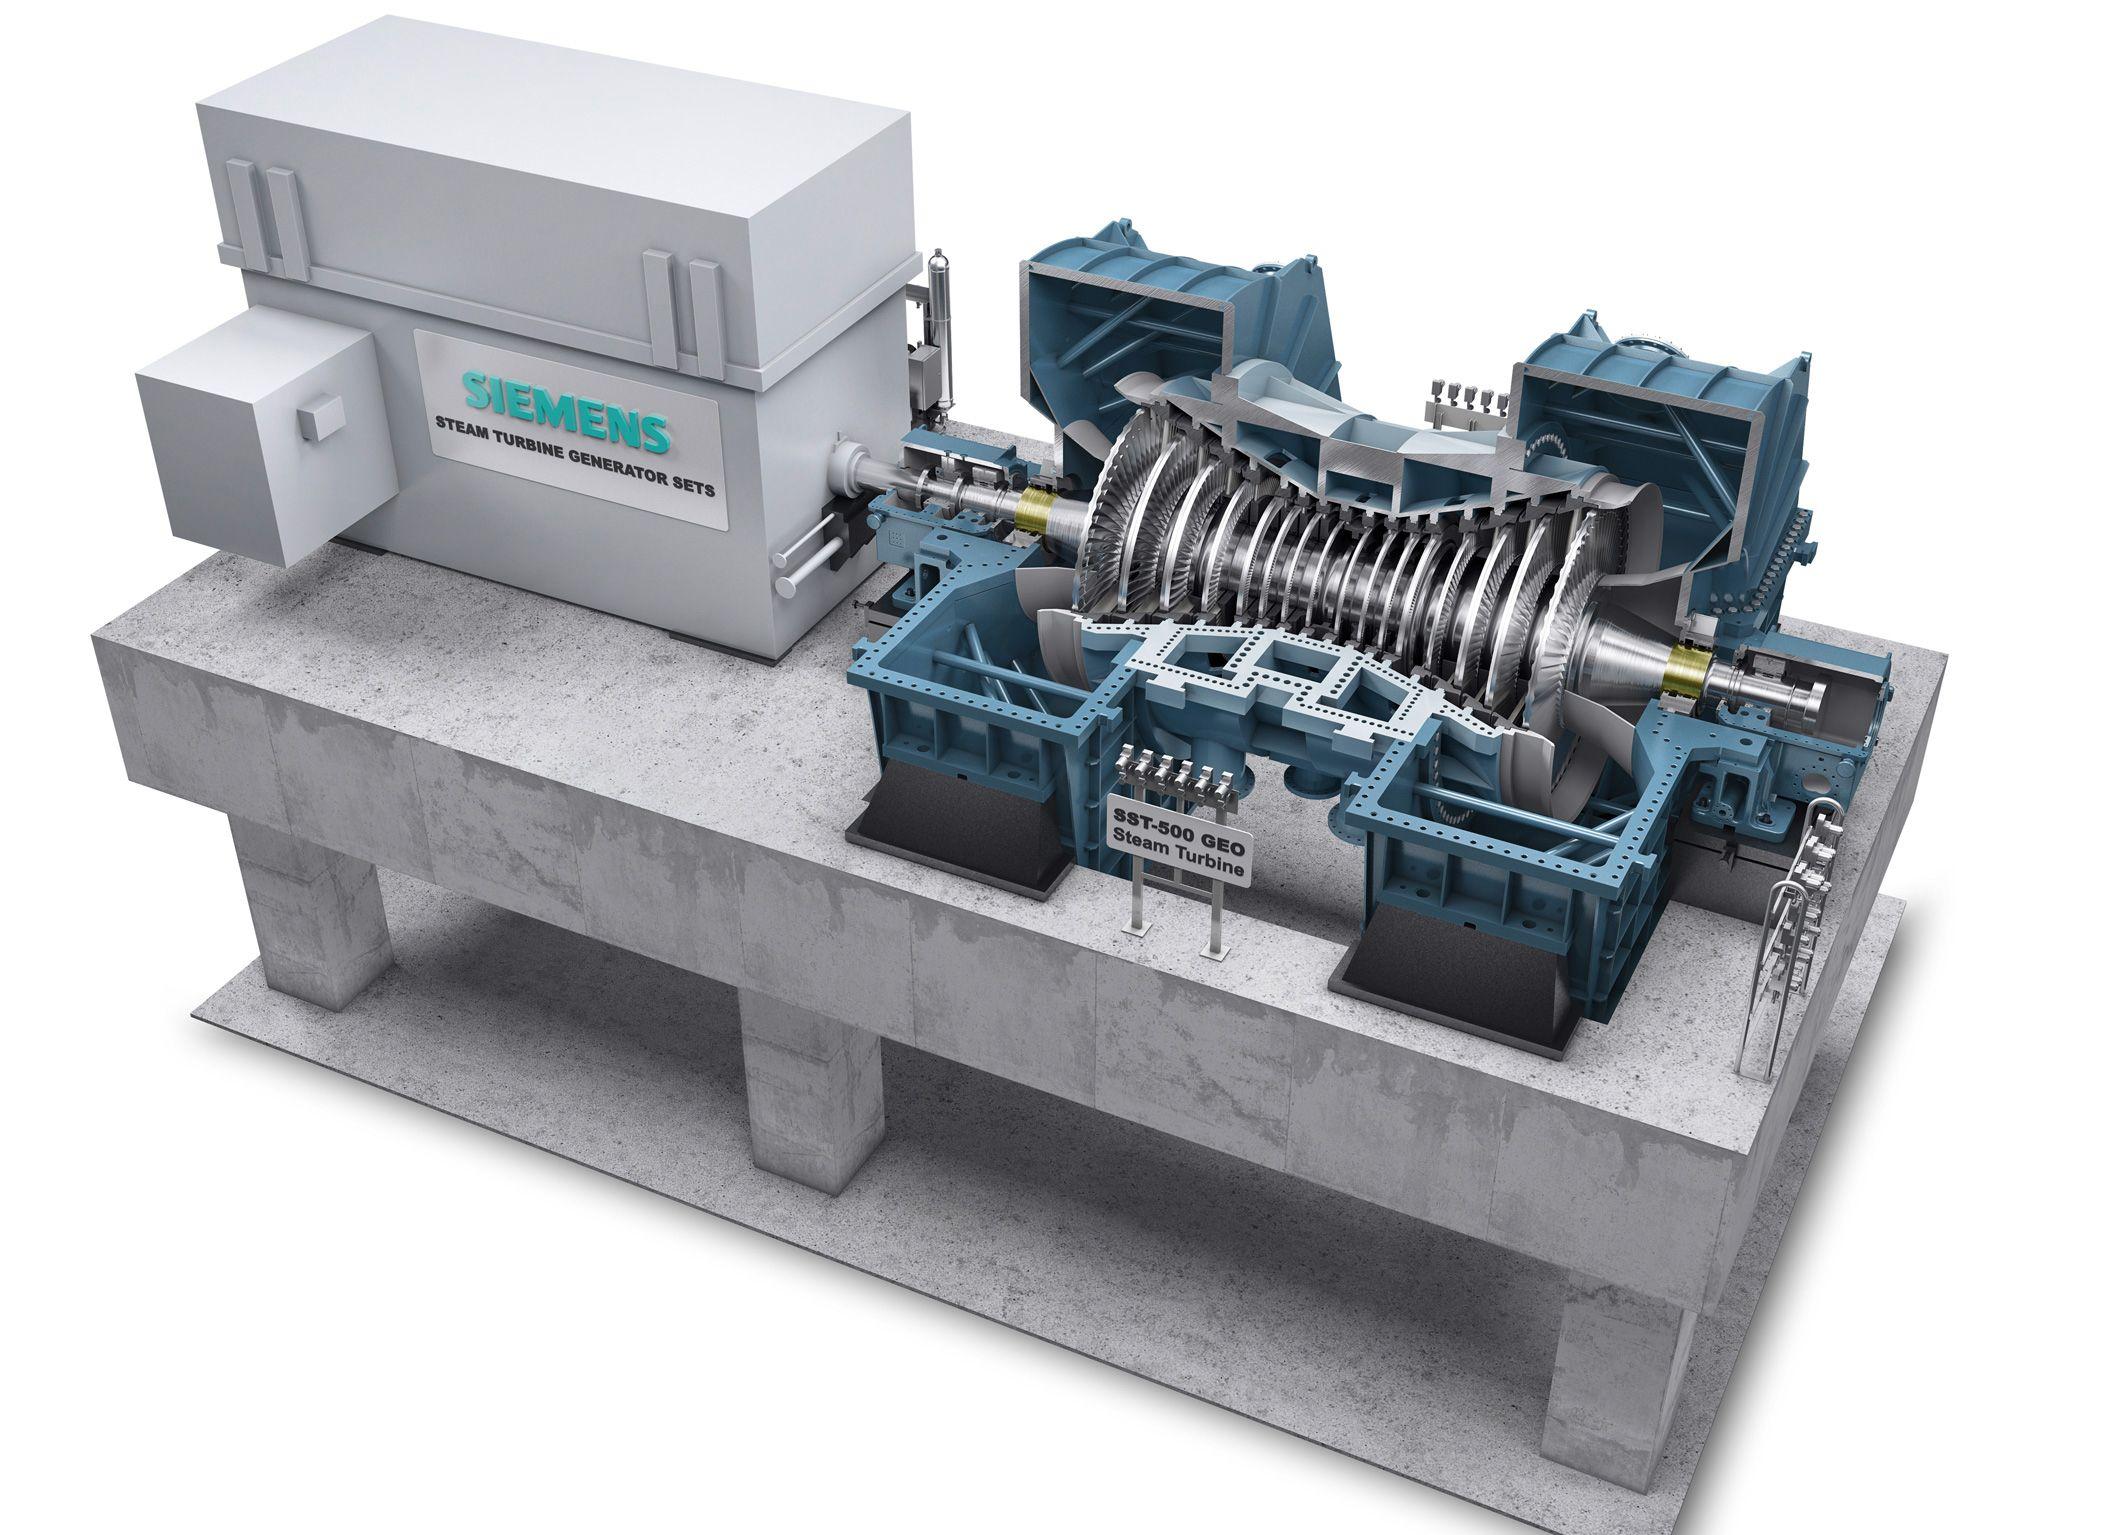 Siemens Develops Sst 500 Geo Steam Turbine For Geothermal Power Plant Layout Diagram Plants